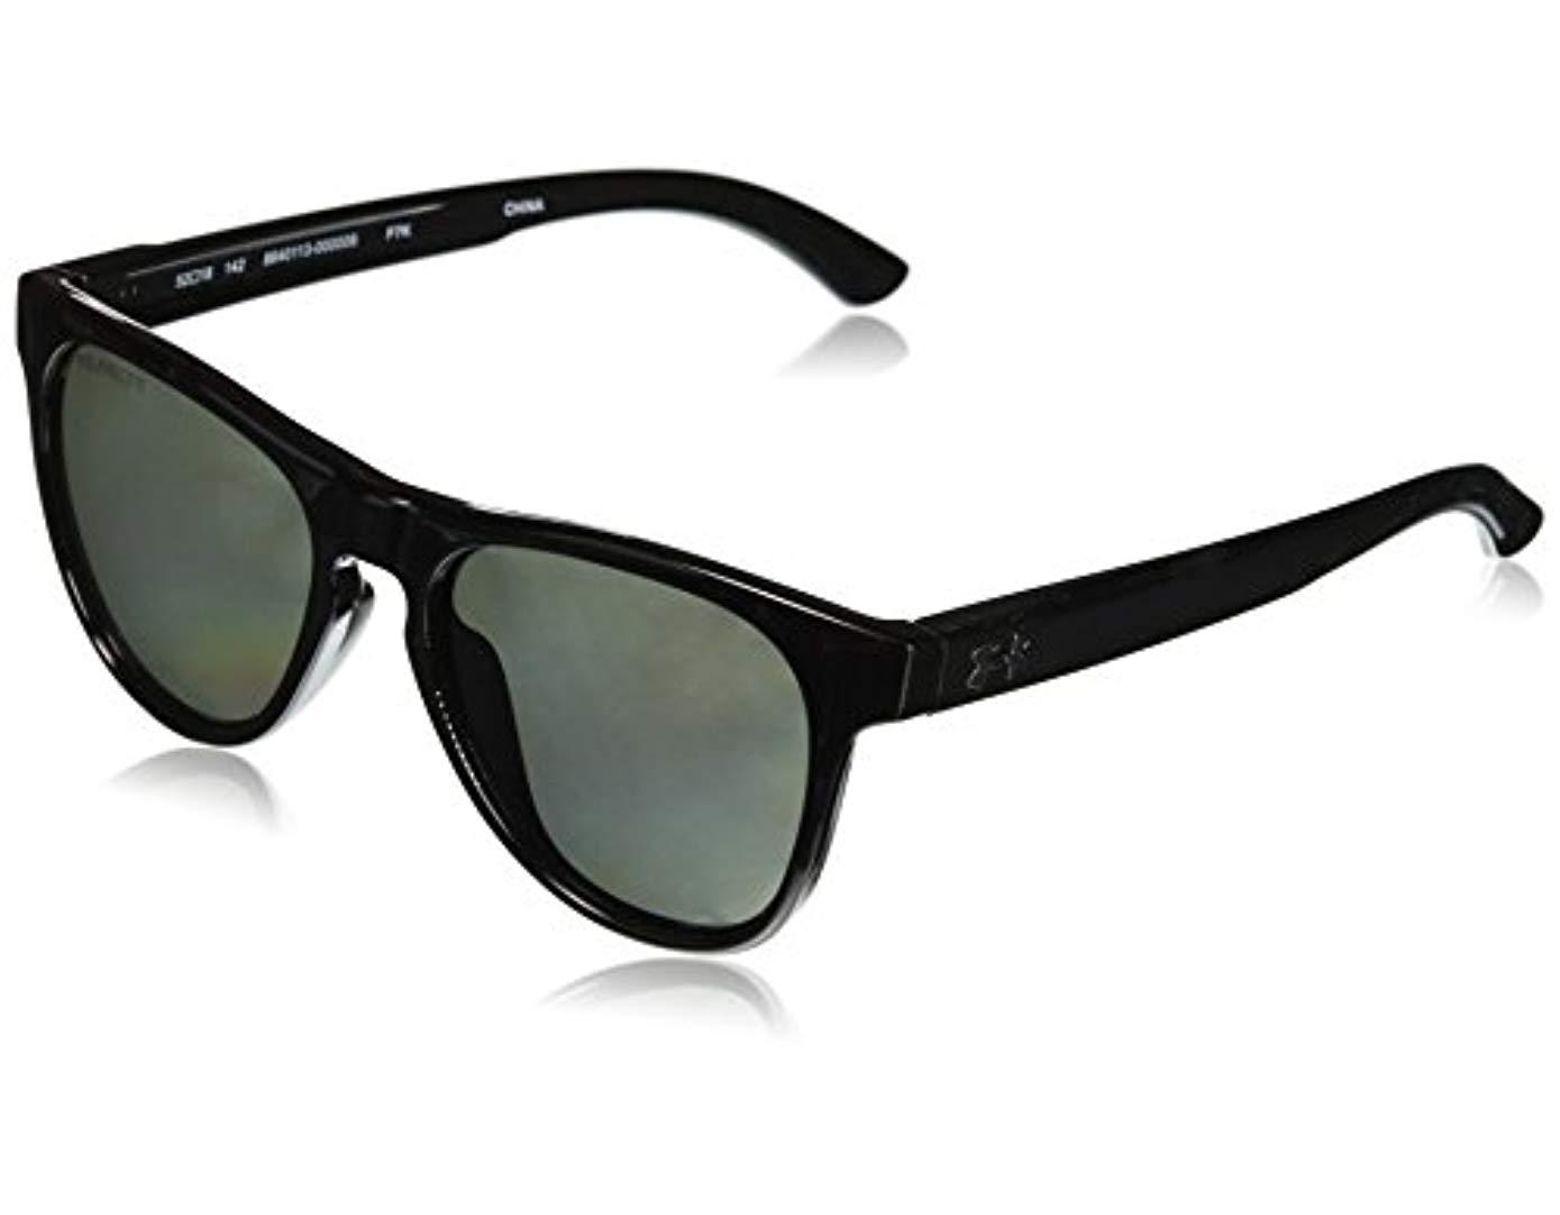 aea9620208da Under Armour Round Sunglasses, Ua Scheme Storm Gloss Black/gray Polar Lens,  M in Black for Men - Save 61% - Lyst